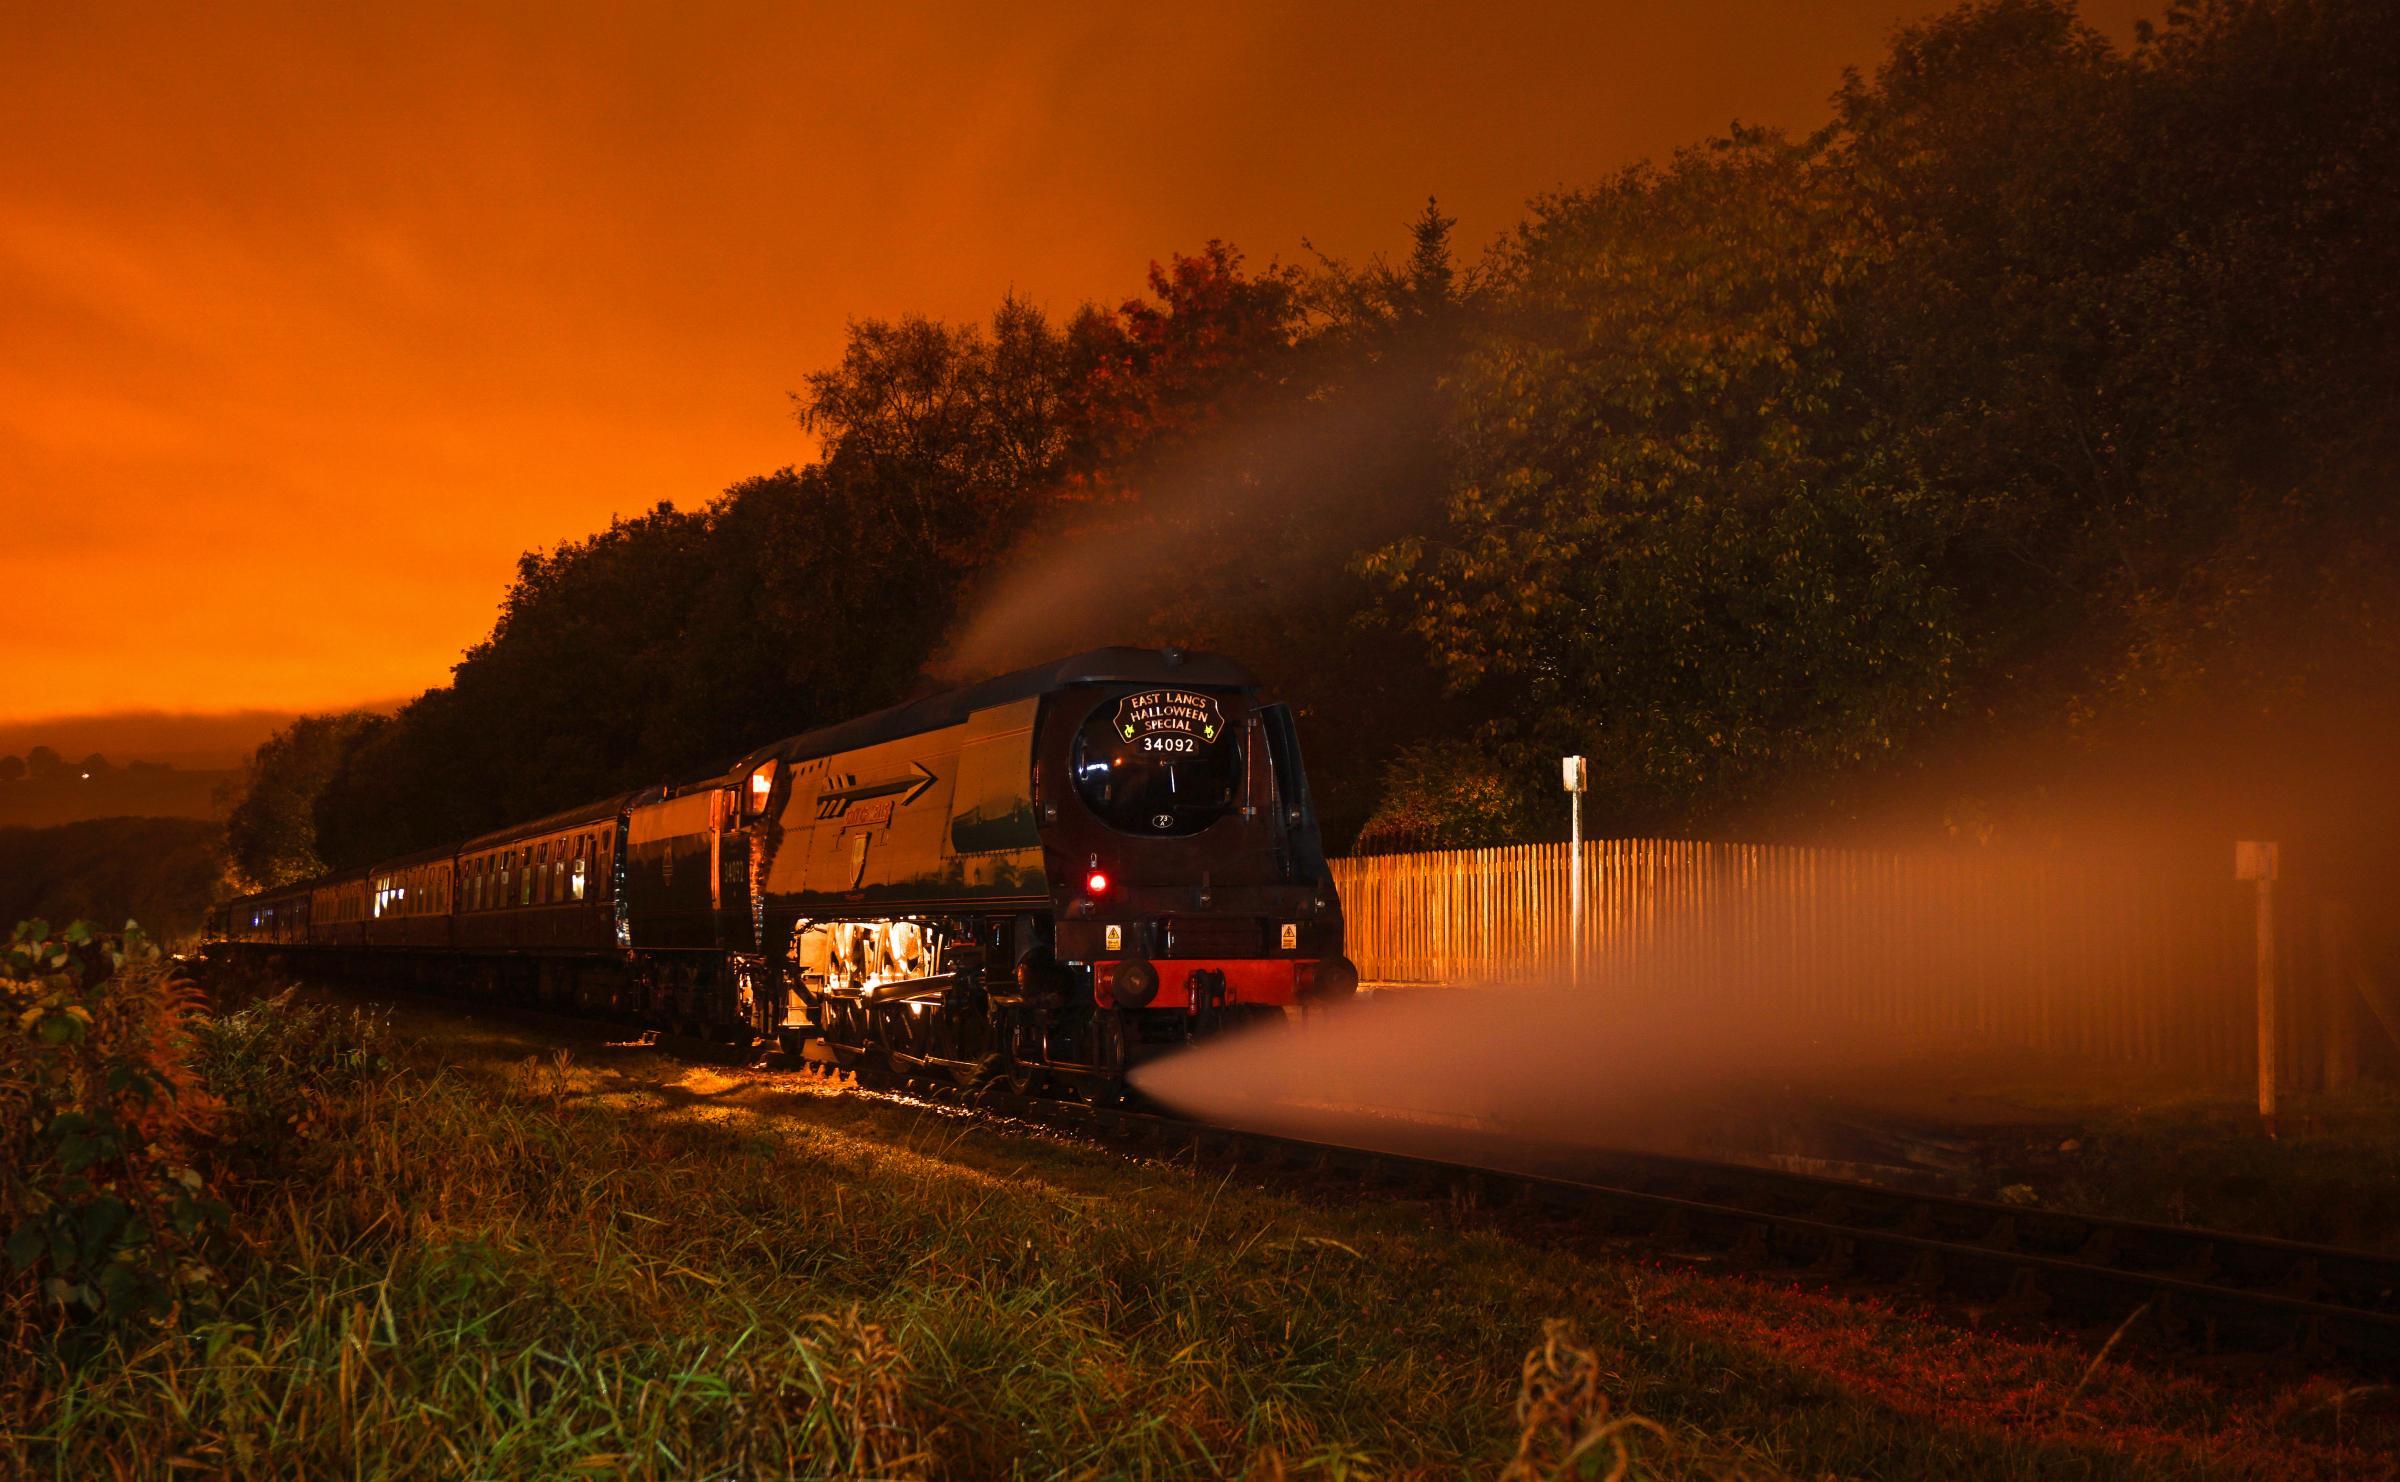 Halloween Train   East Lancashire Railway Announces Ghost Train Dates For Little